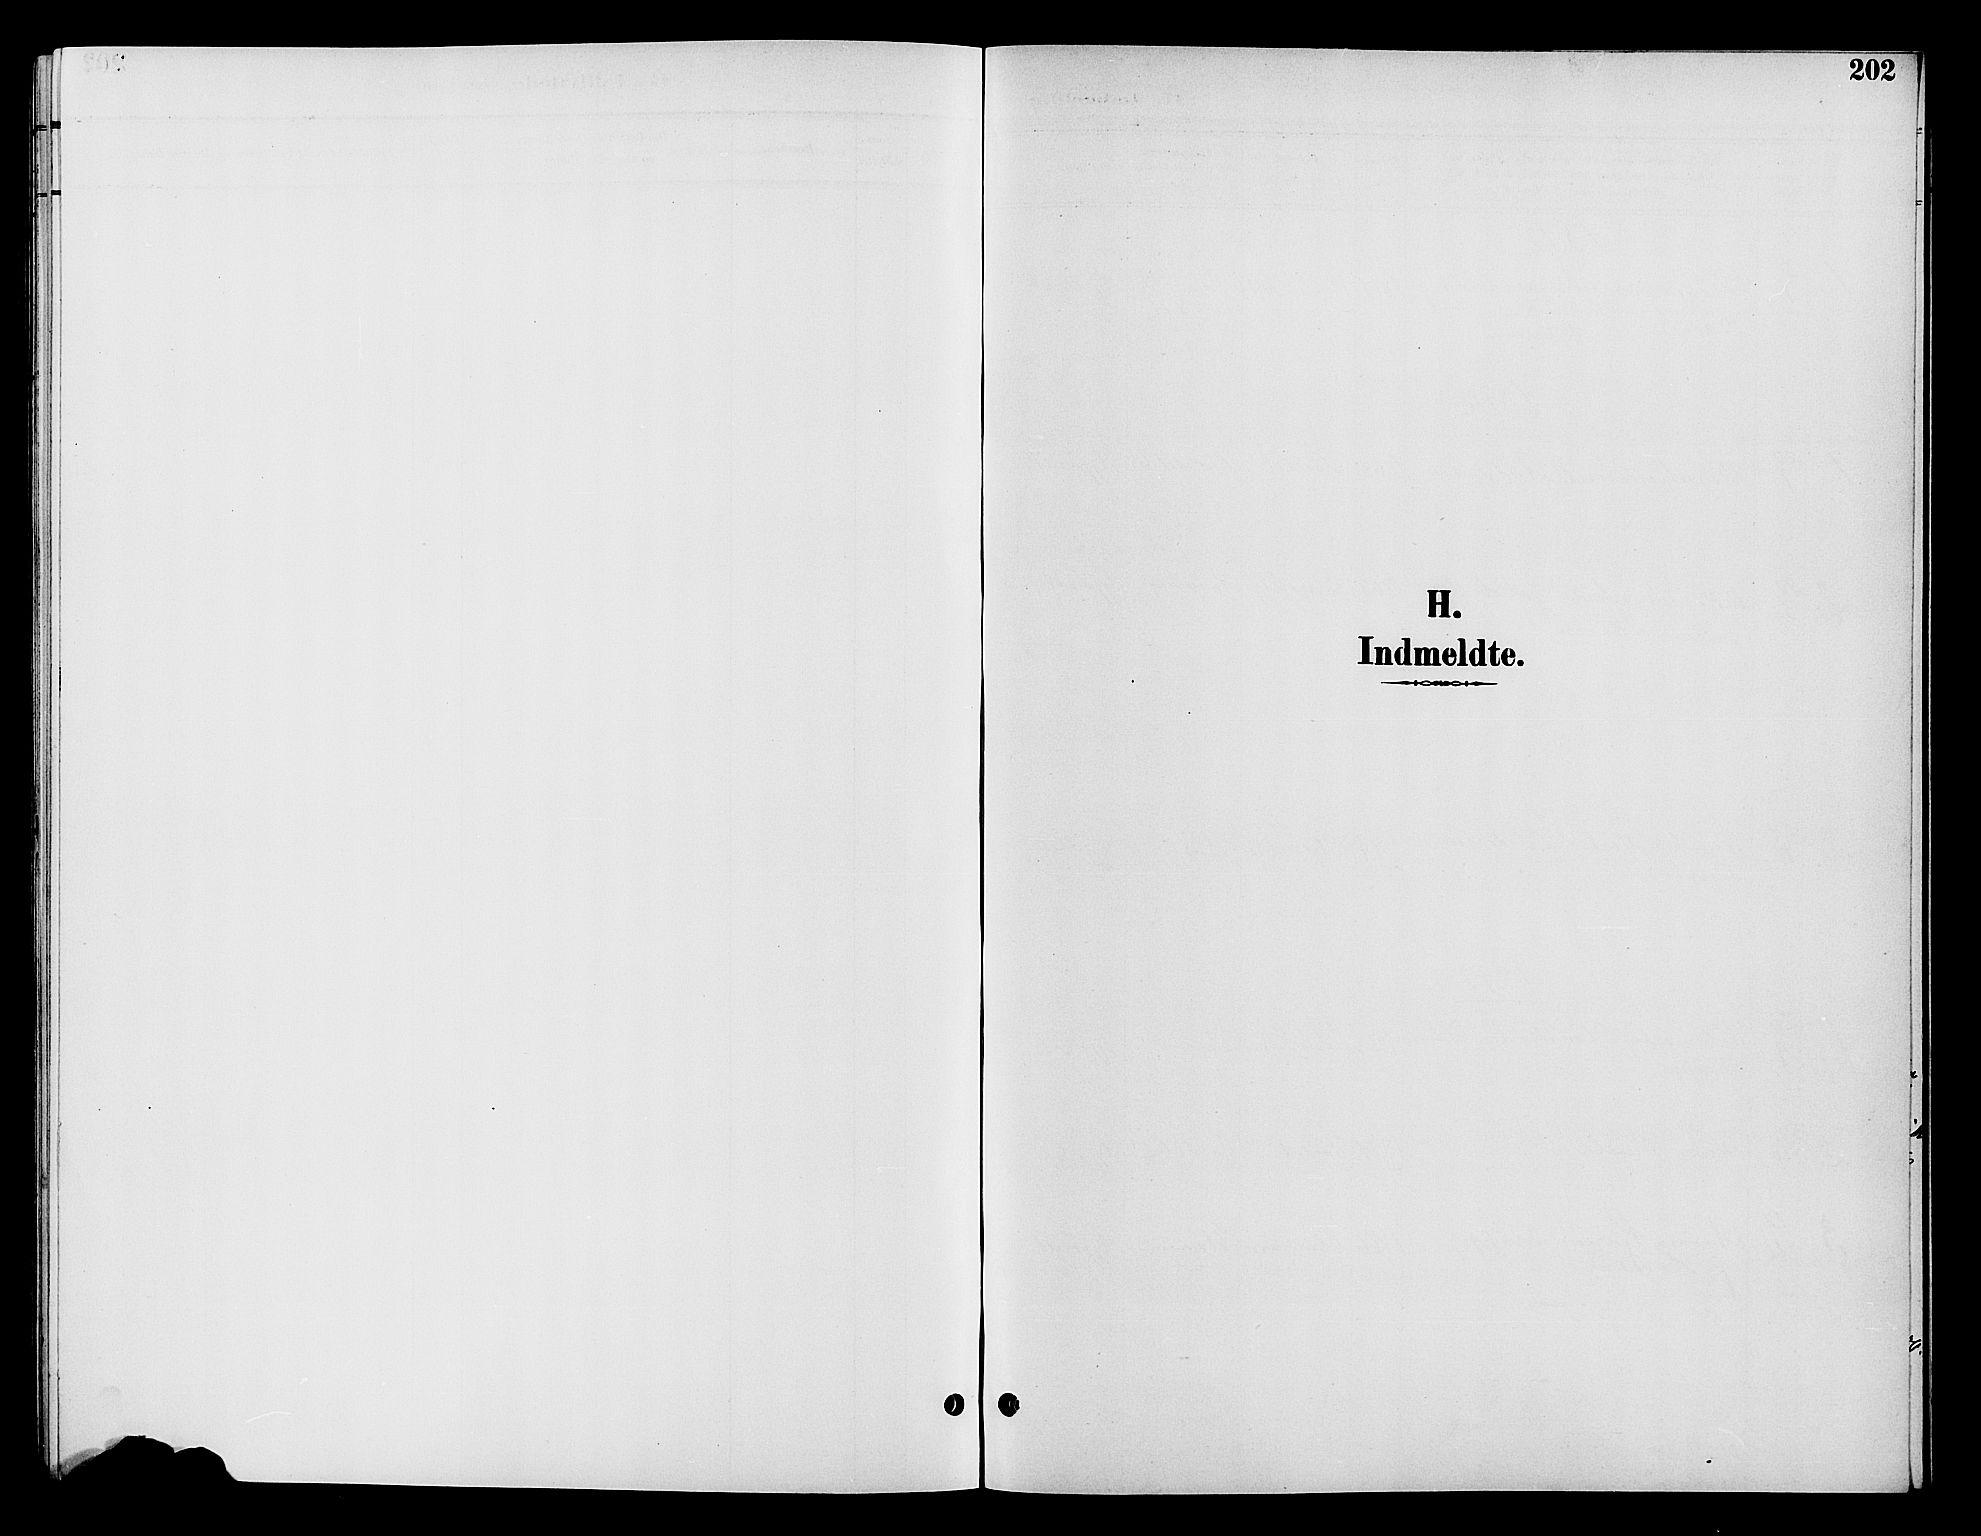 SAH, Vardal prestekontor, H/Ha/Hab/L0009: Klokkerbok nr. 9, 1894-1902, s. 202